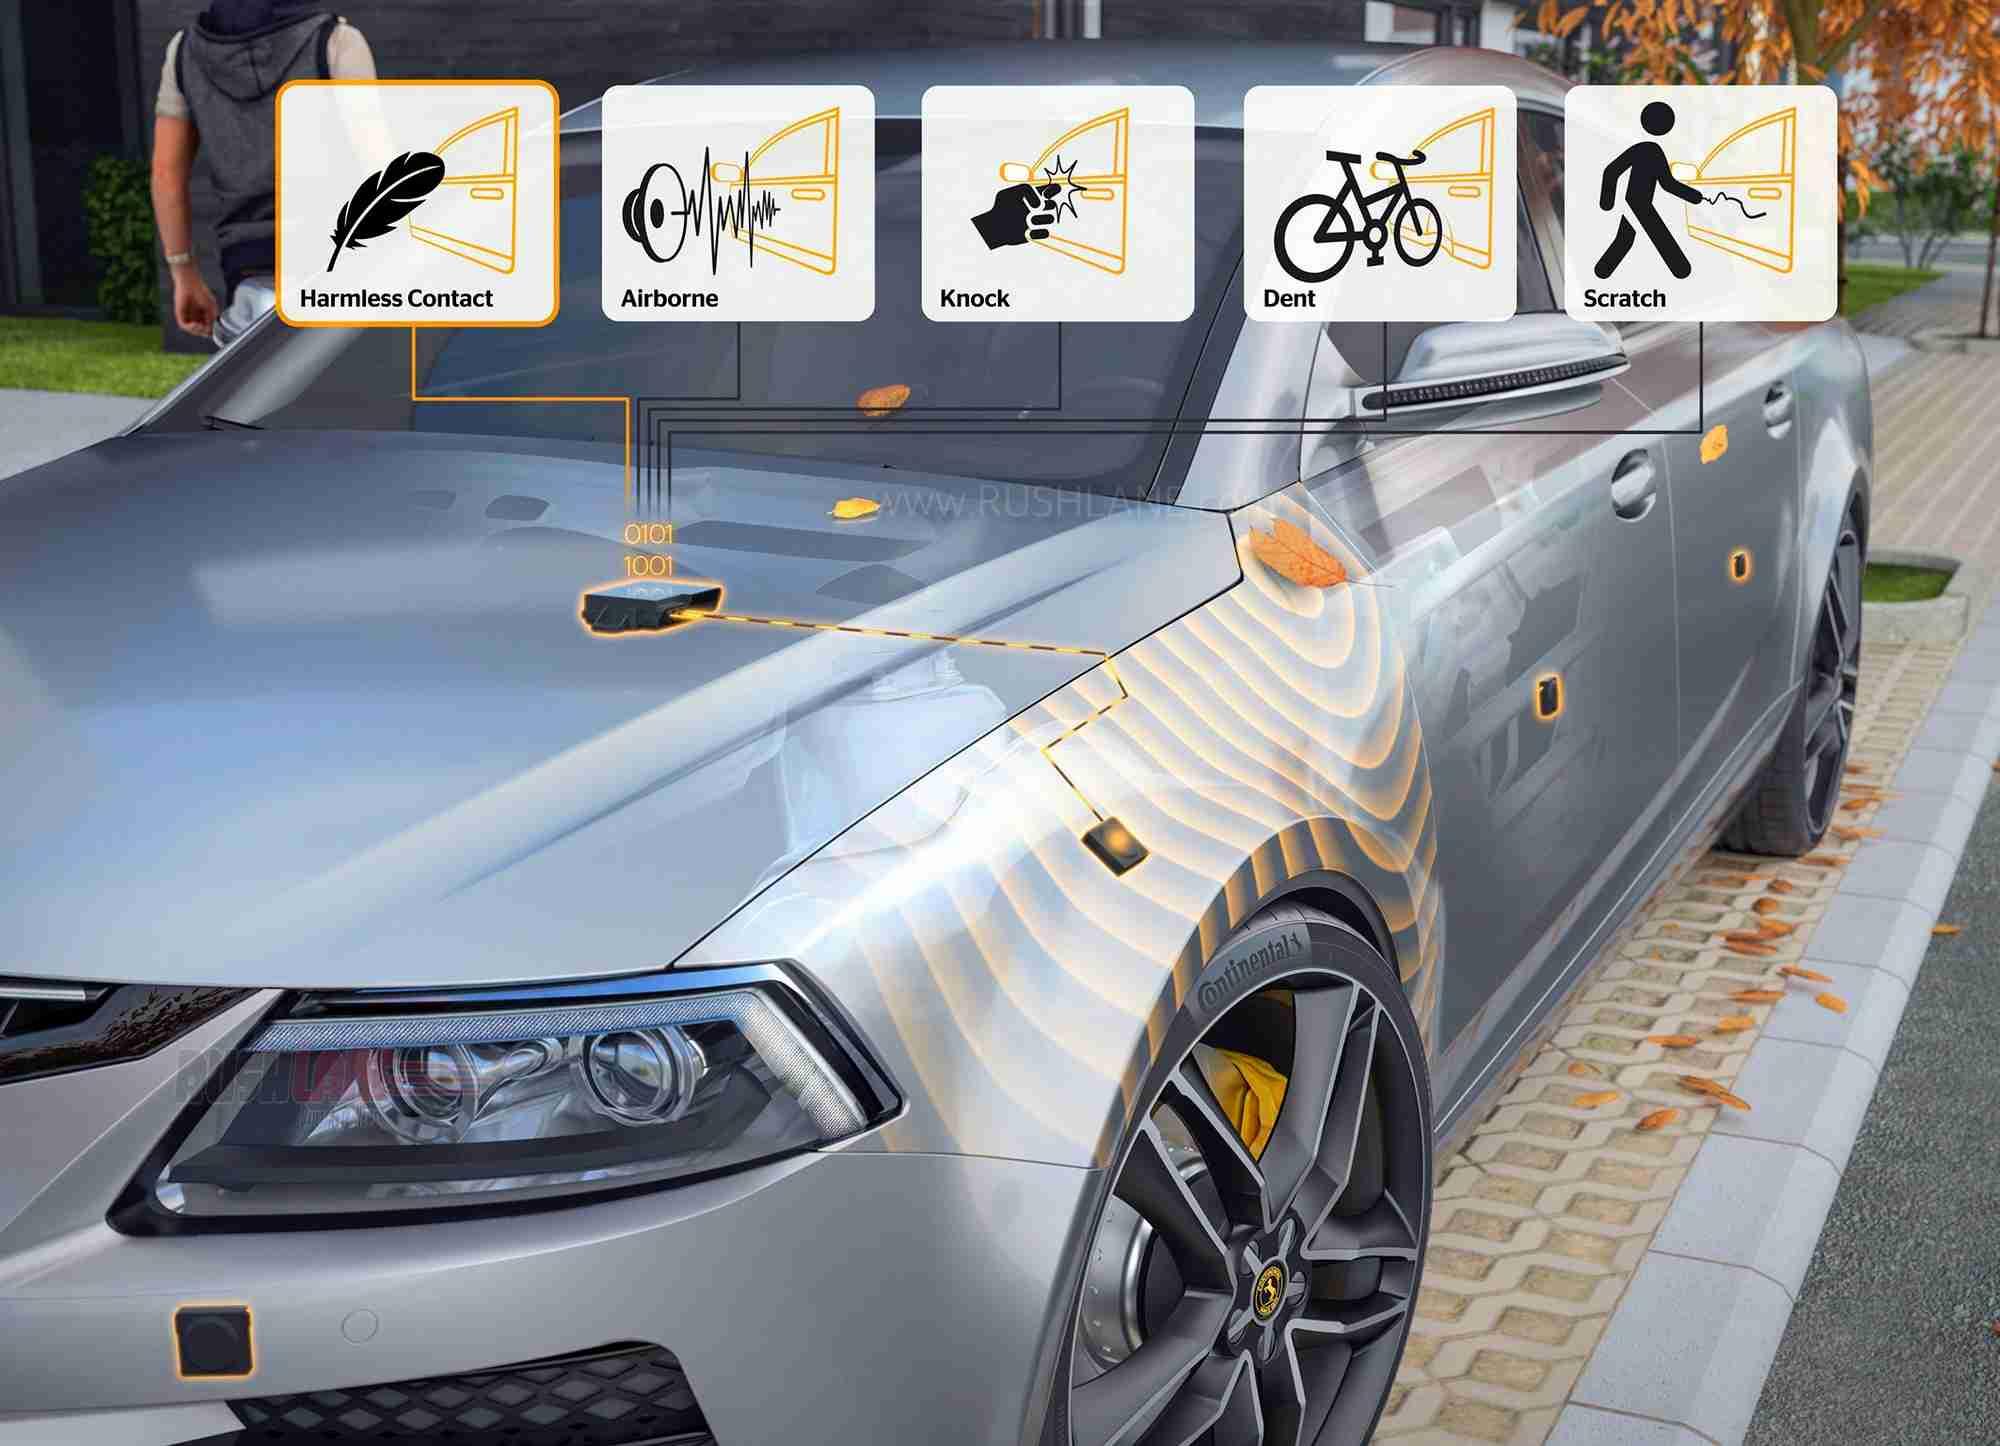 Continental automatic parking sensor